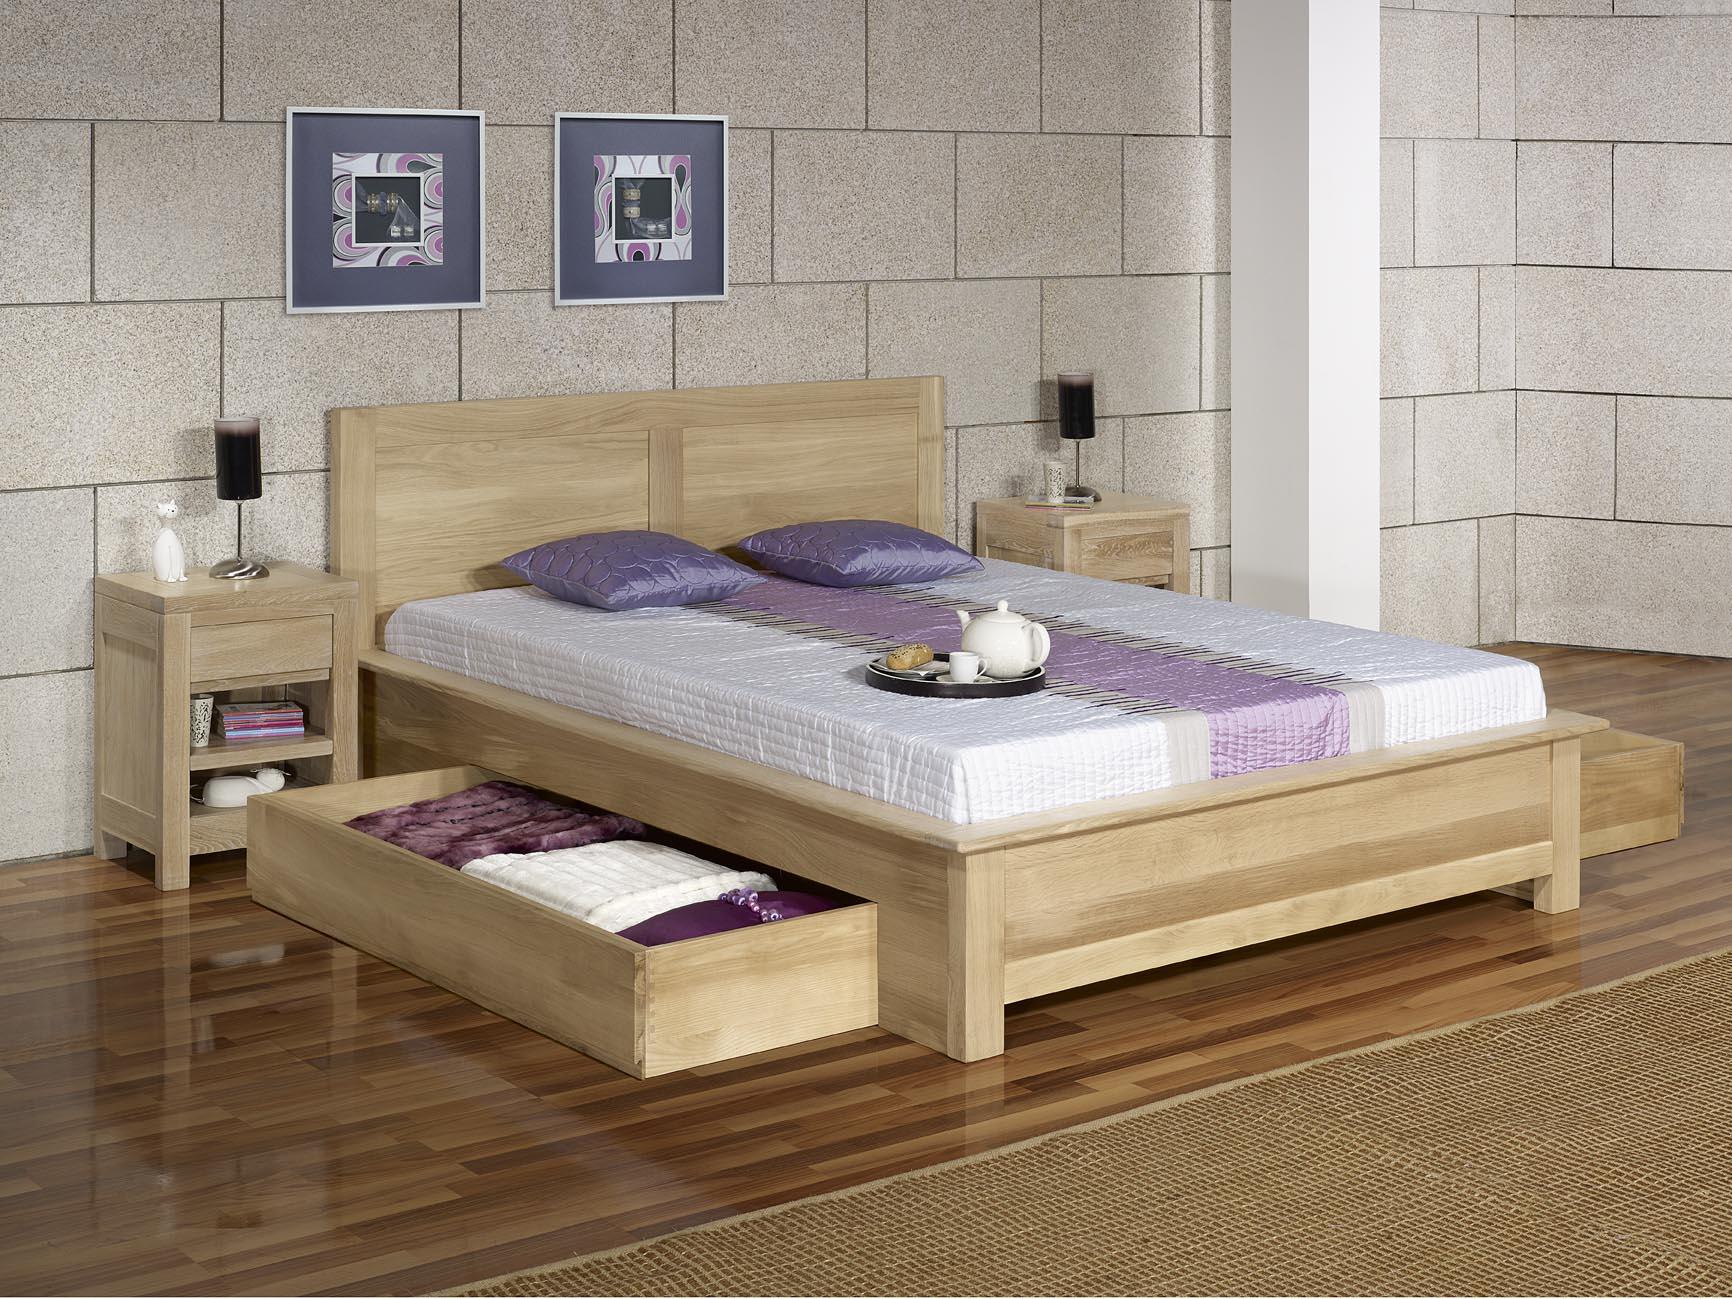 lit collection nature 140 190 en ch ne massif avec tiroirs. Black Bedroom Furniture Sets. Home Design Ideas